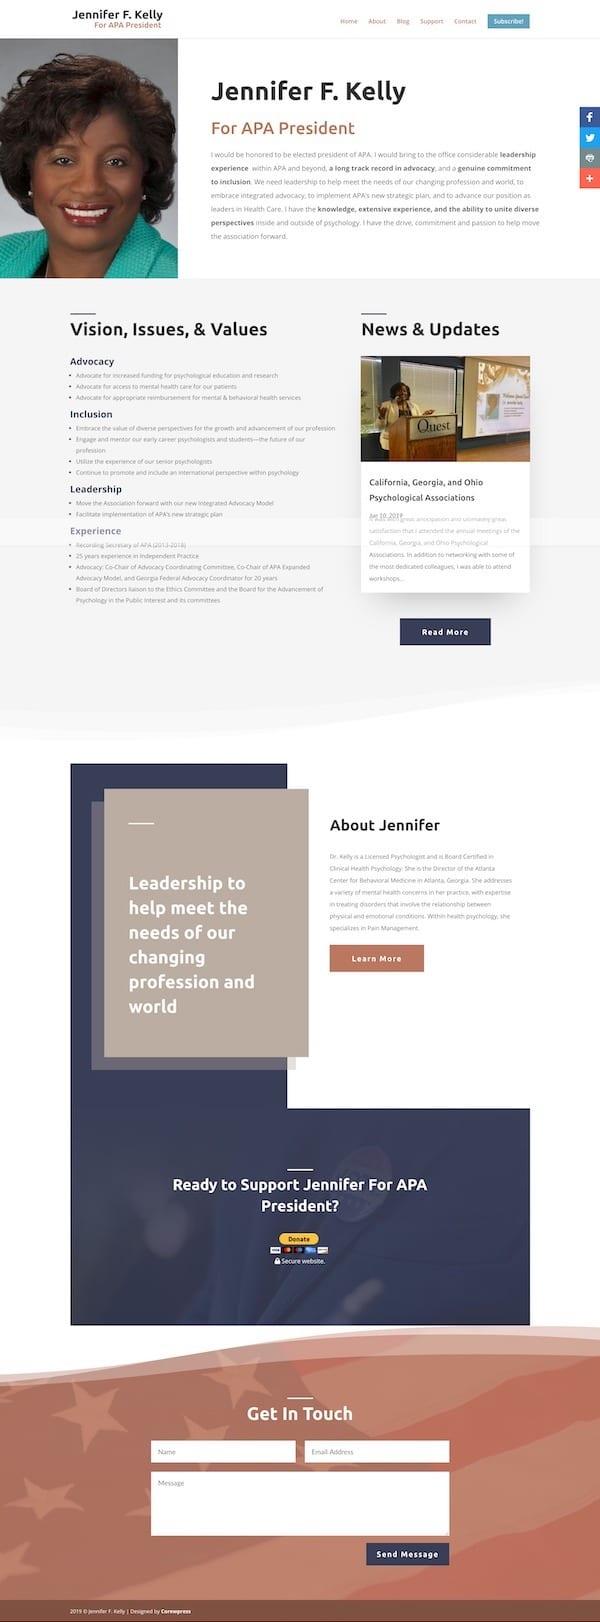 Jennifer F. Kelly WordPress Website